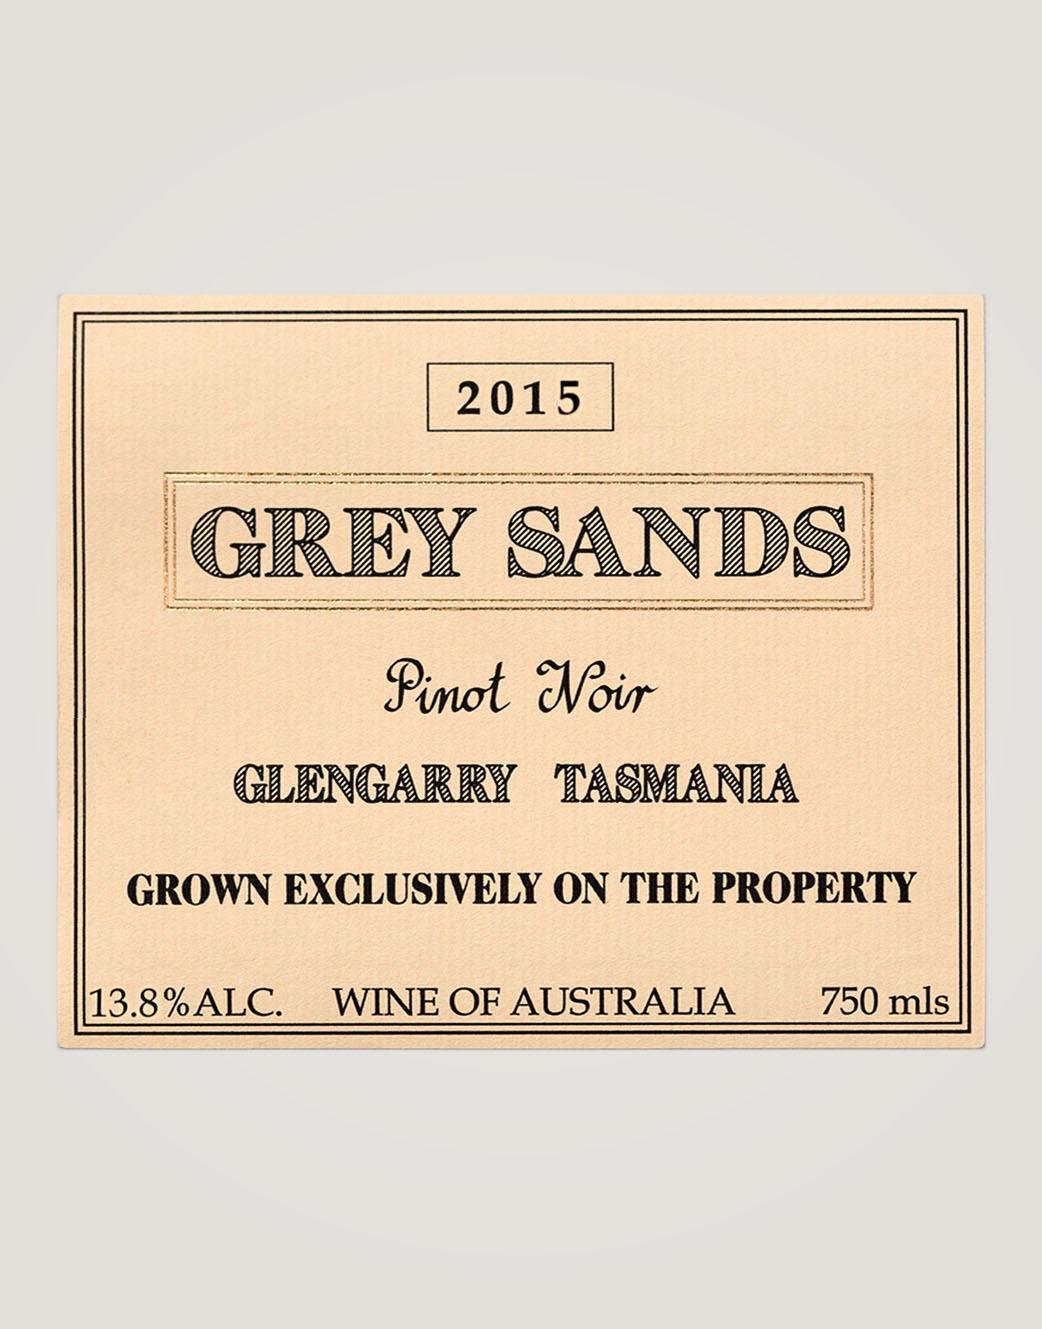 Grey sands 2015 Pinot noir label